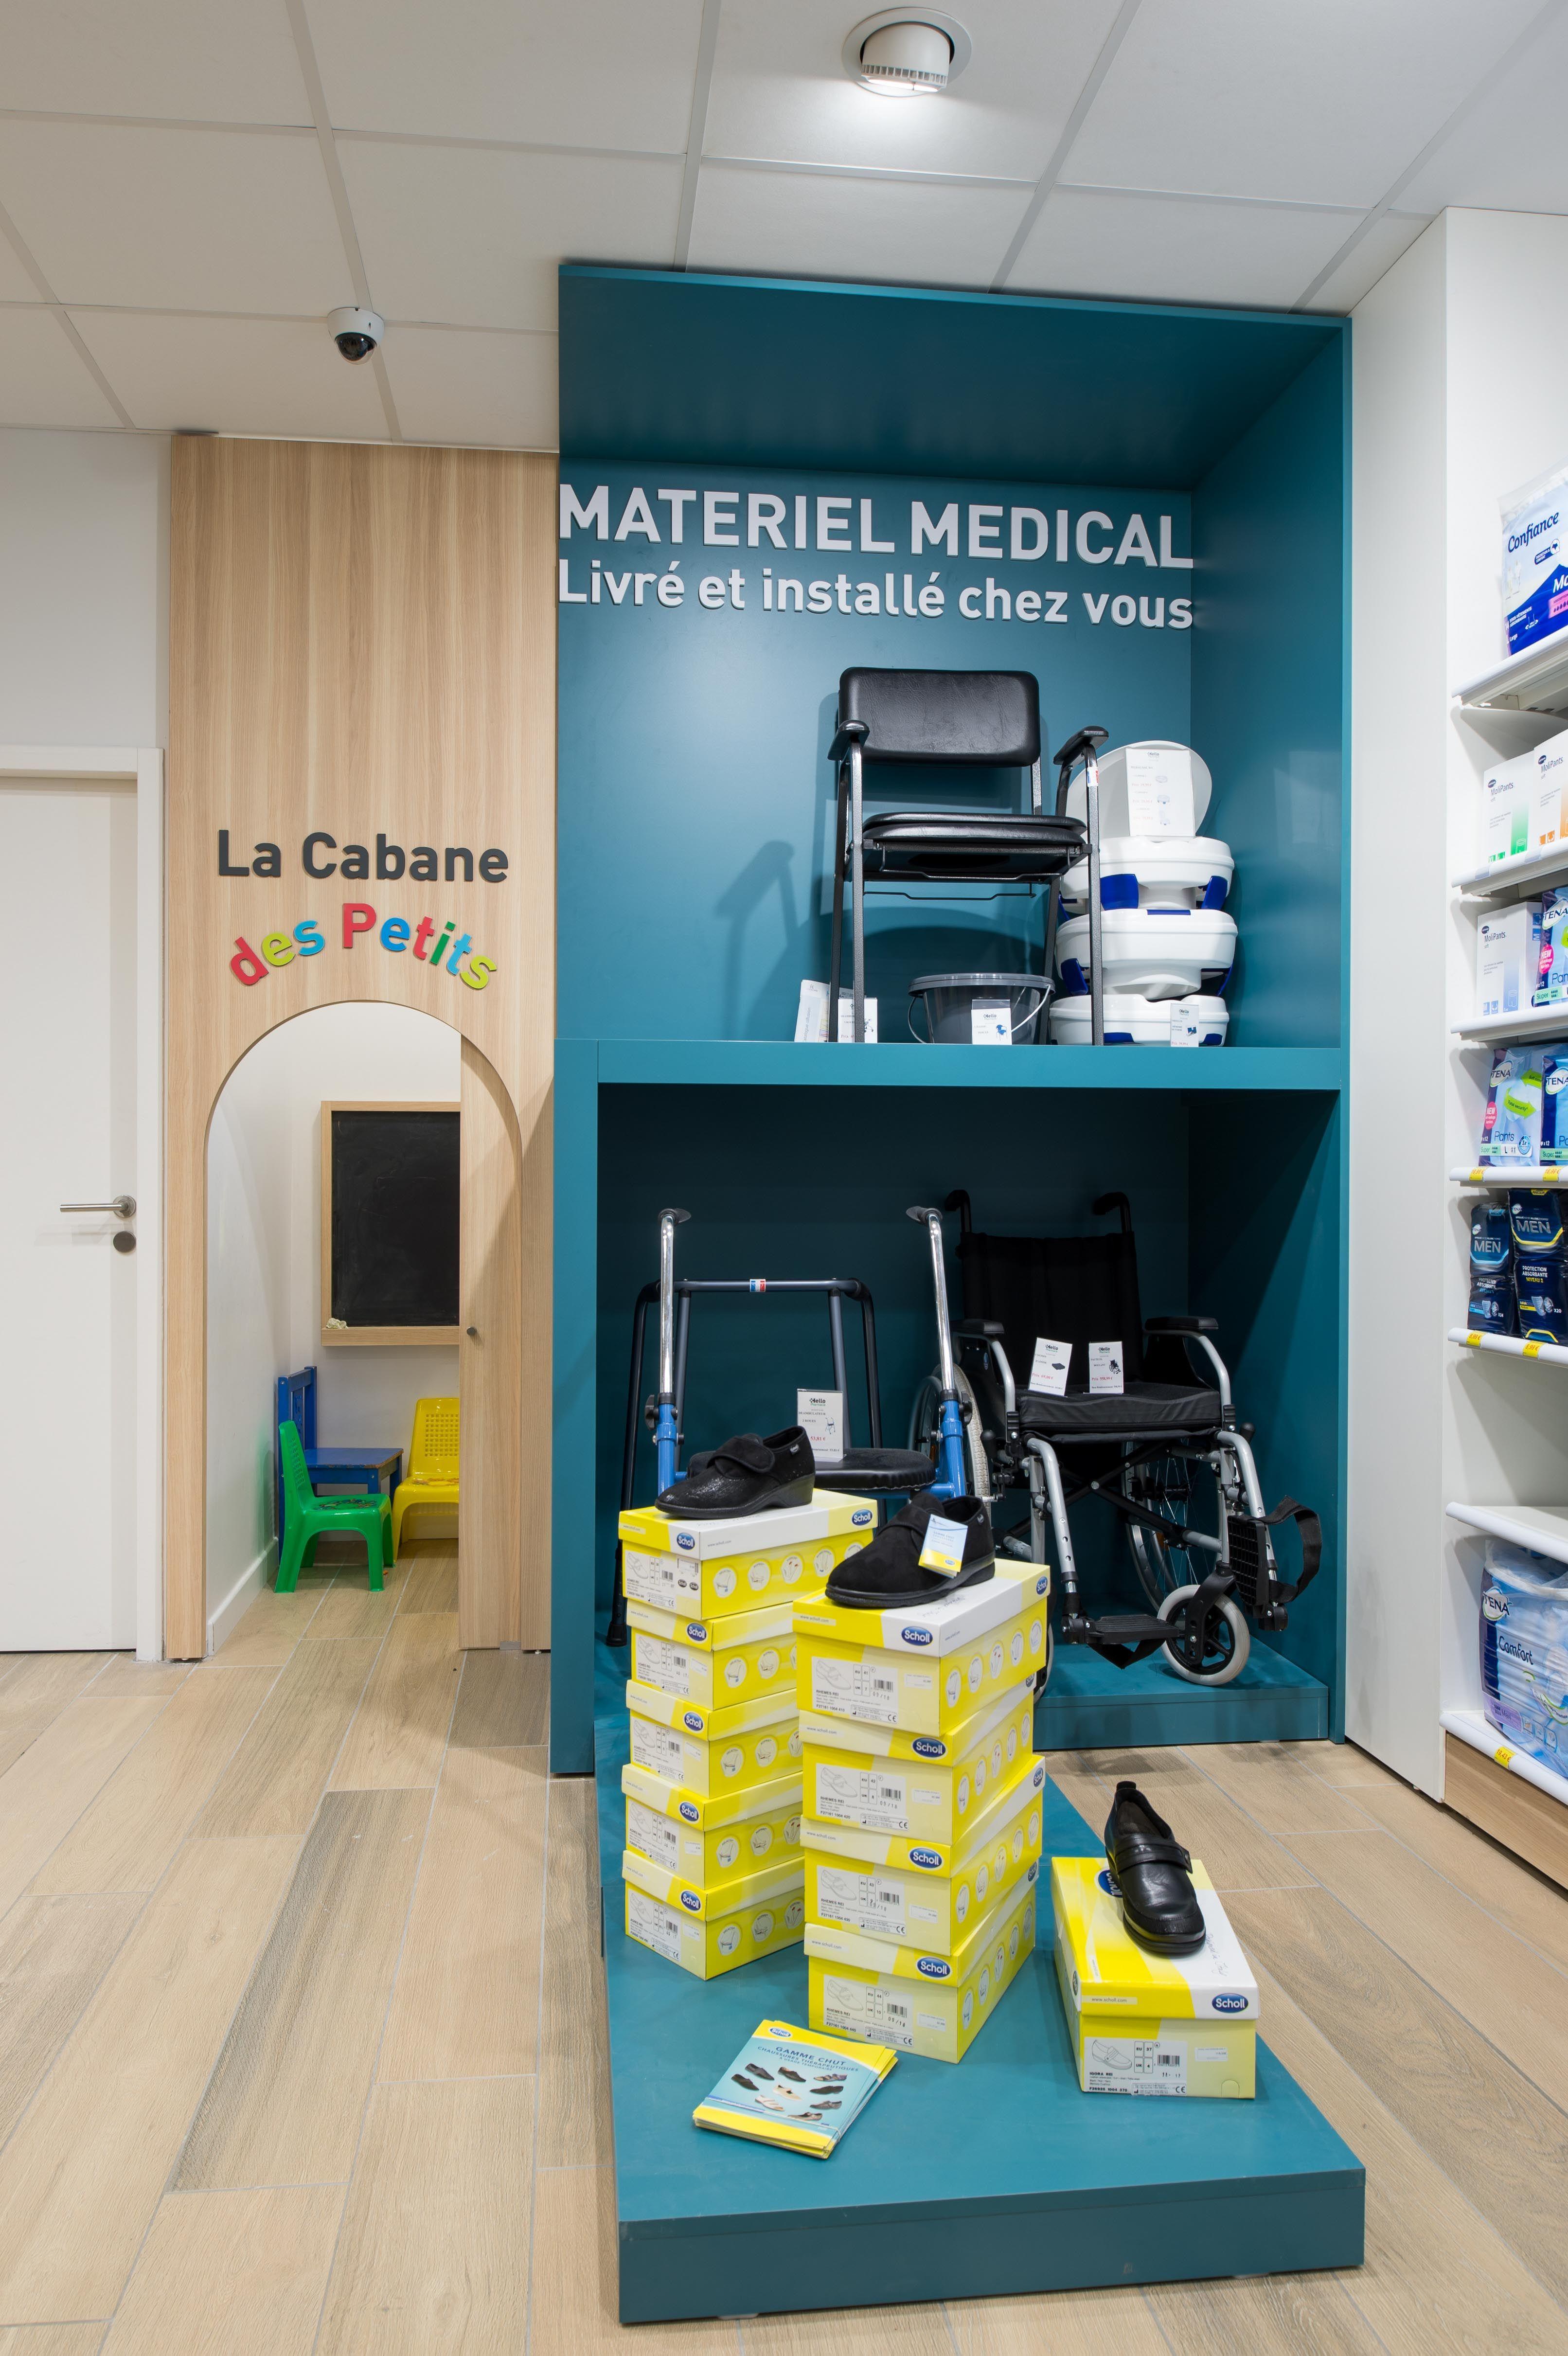 Corner Mad Hello Pharmacie Montelimar 26 Pharmacie Agencement Pharmacie Pharmacie Design